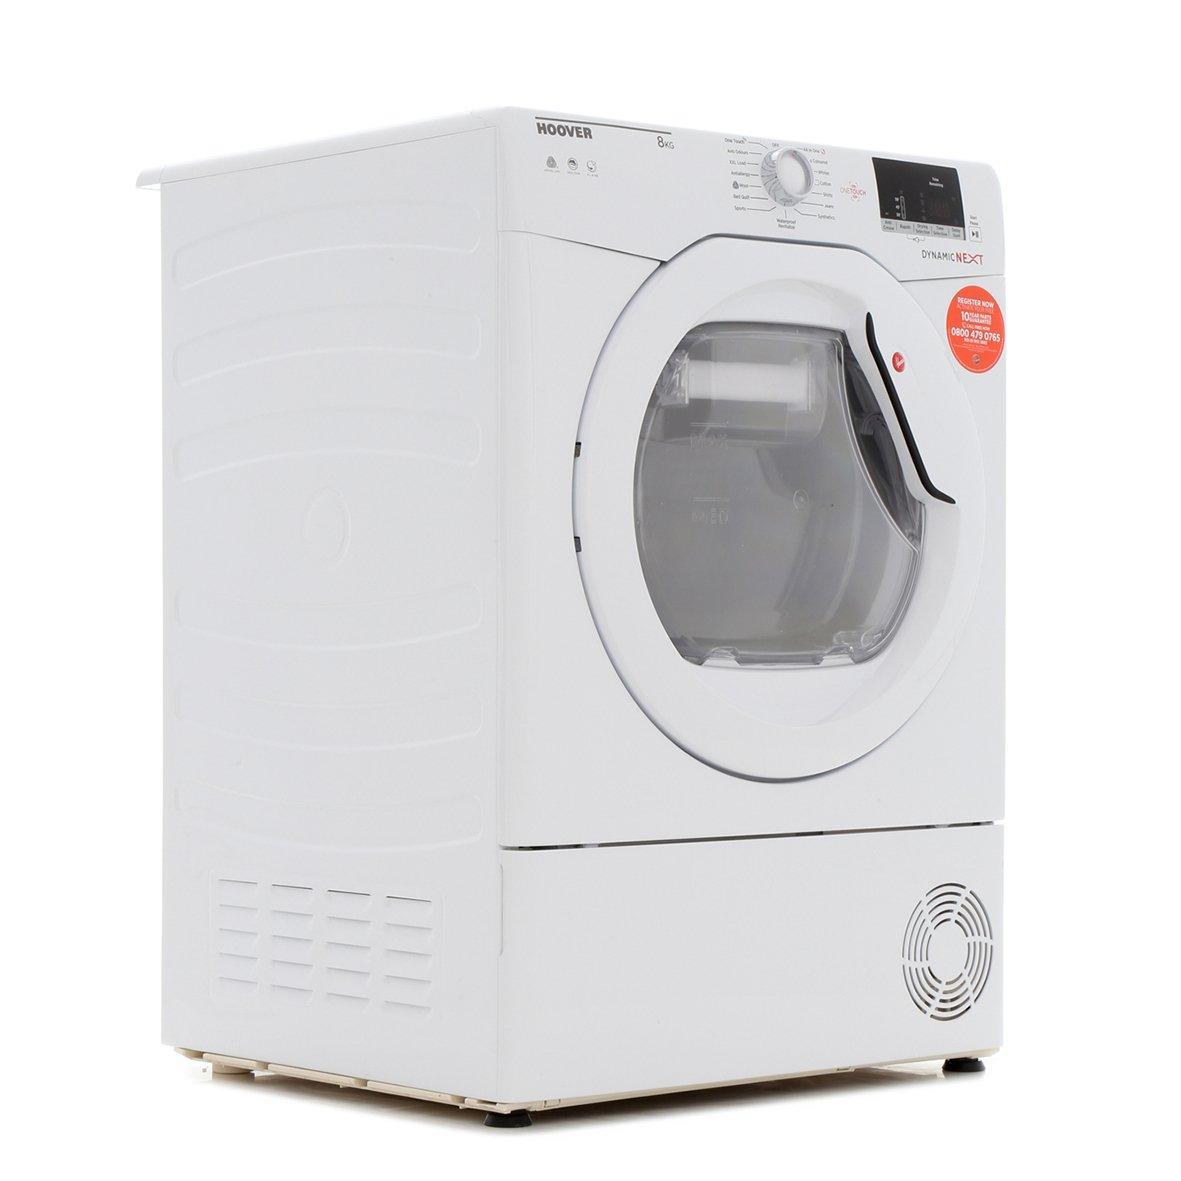 hoover aquavision dryer 9kg manual